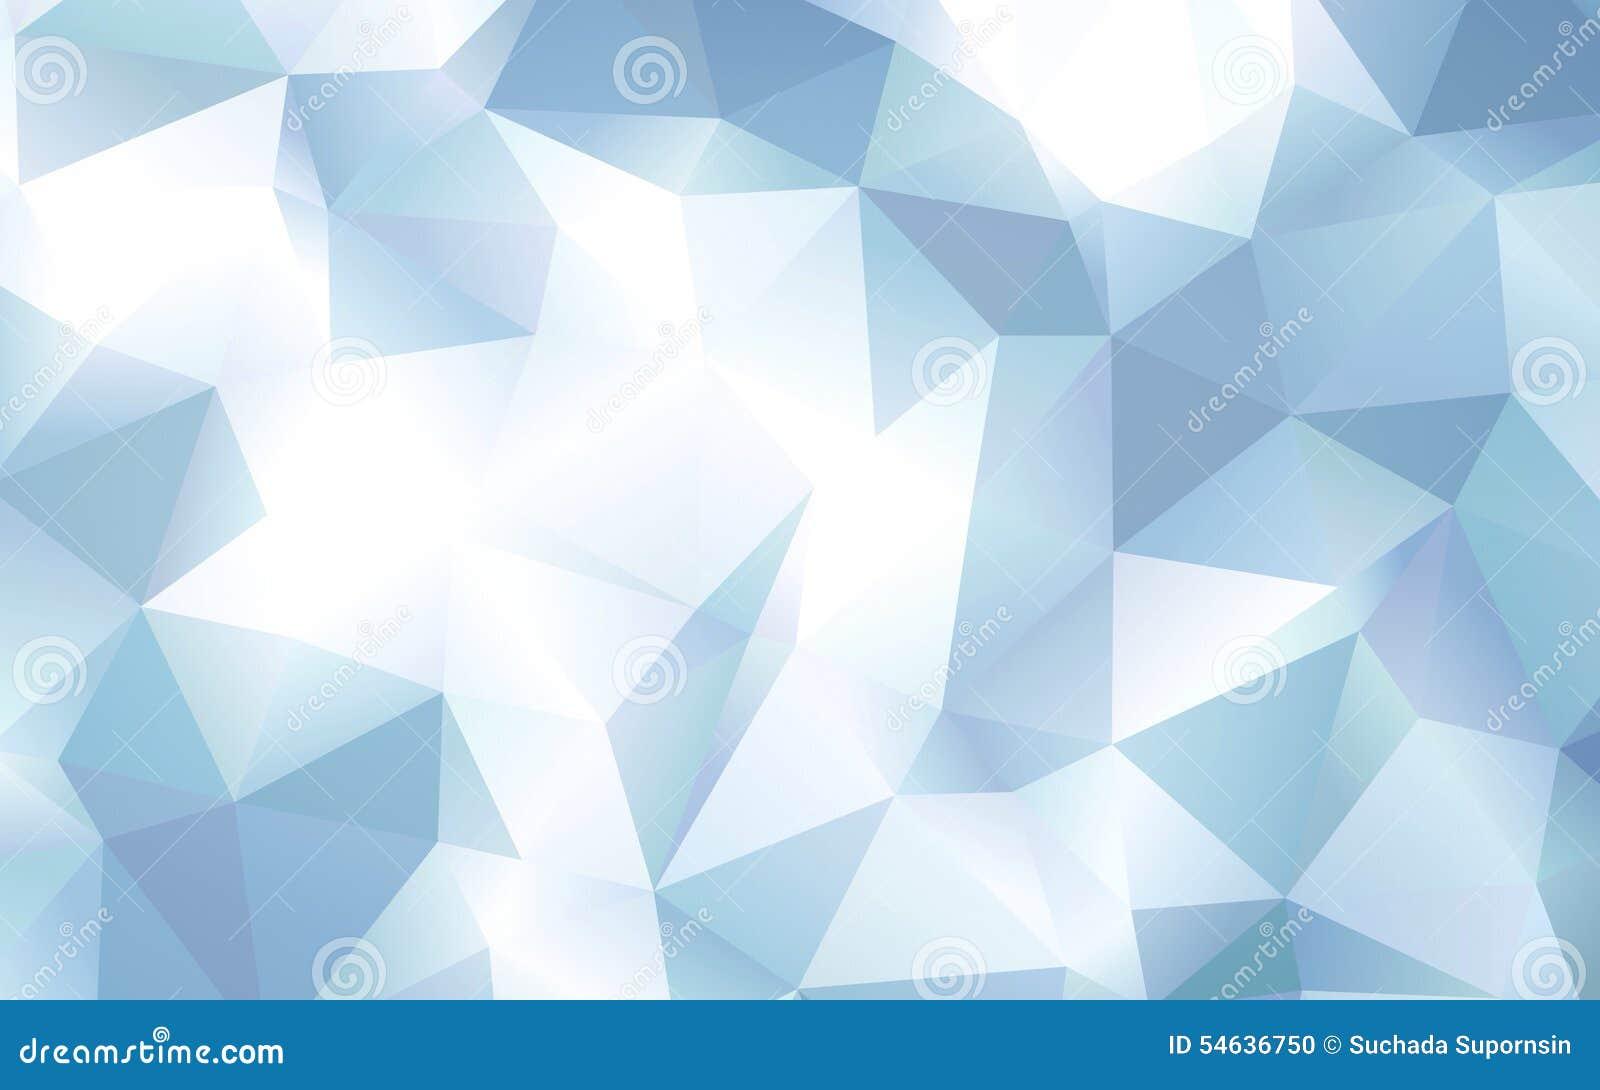 abstract blue polygon pattern wallpaper stock illustration